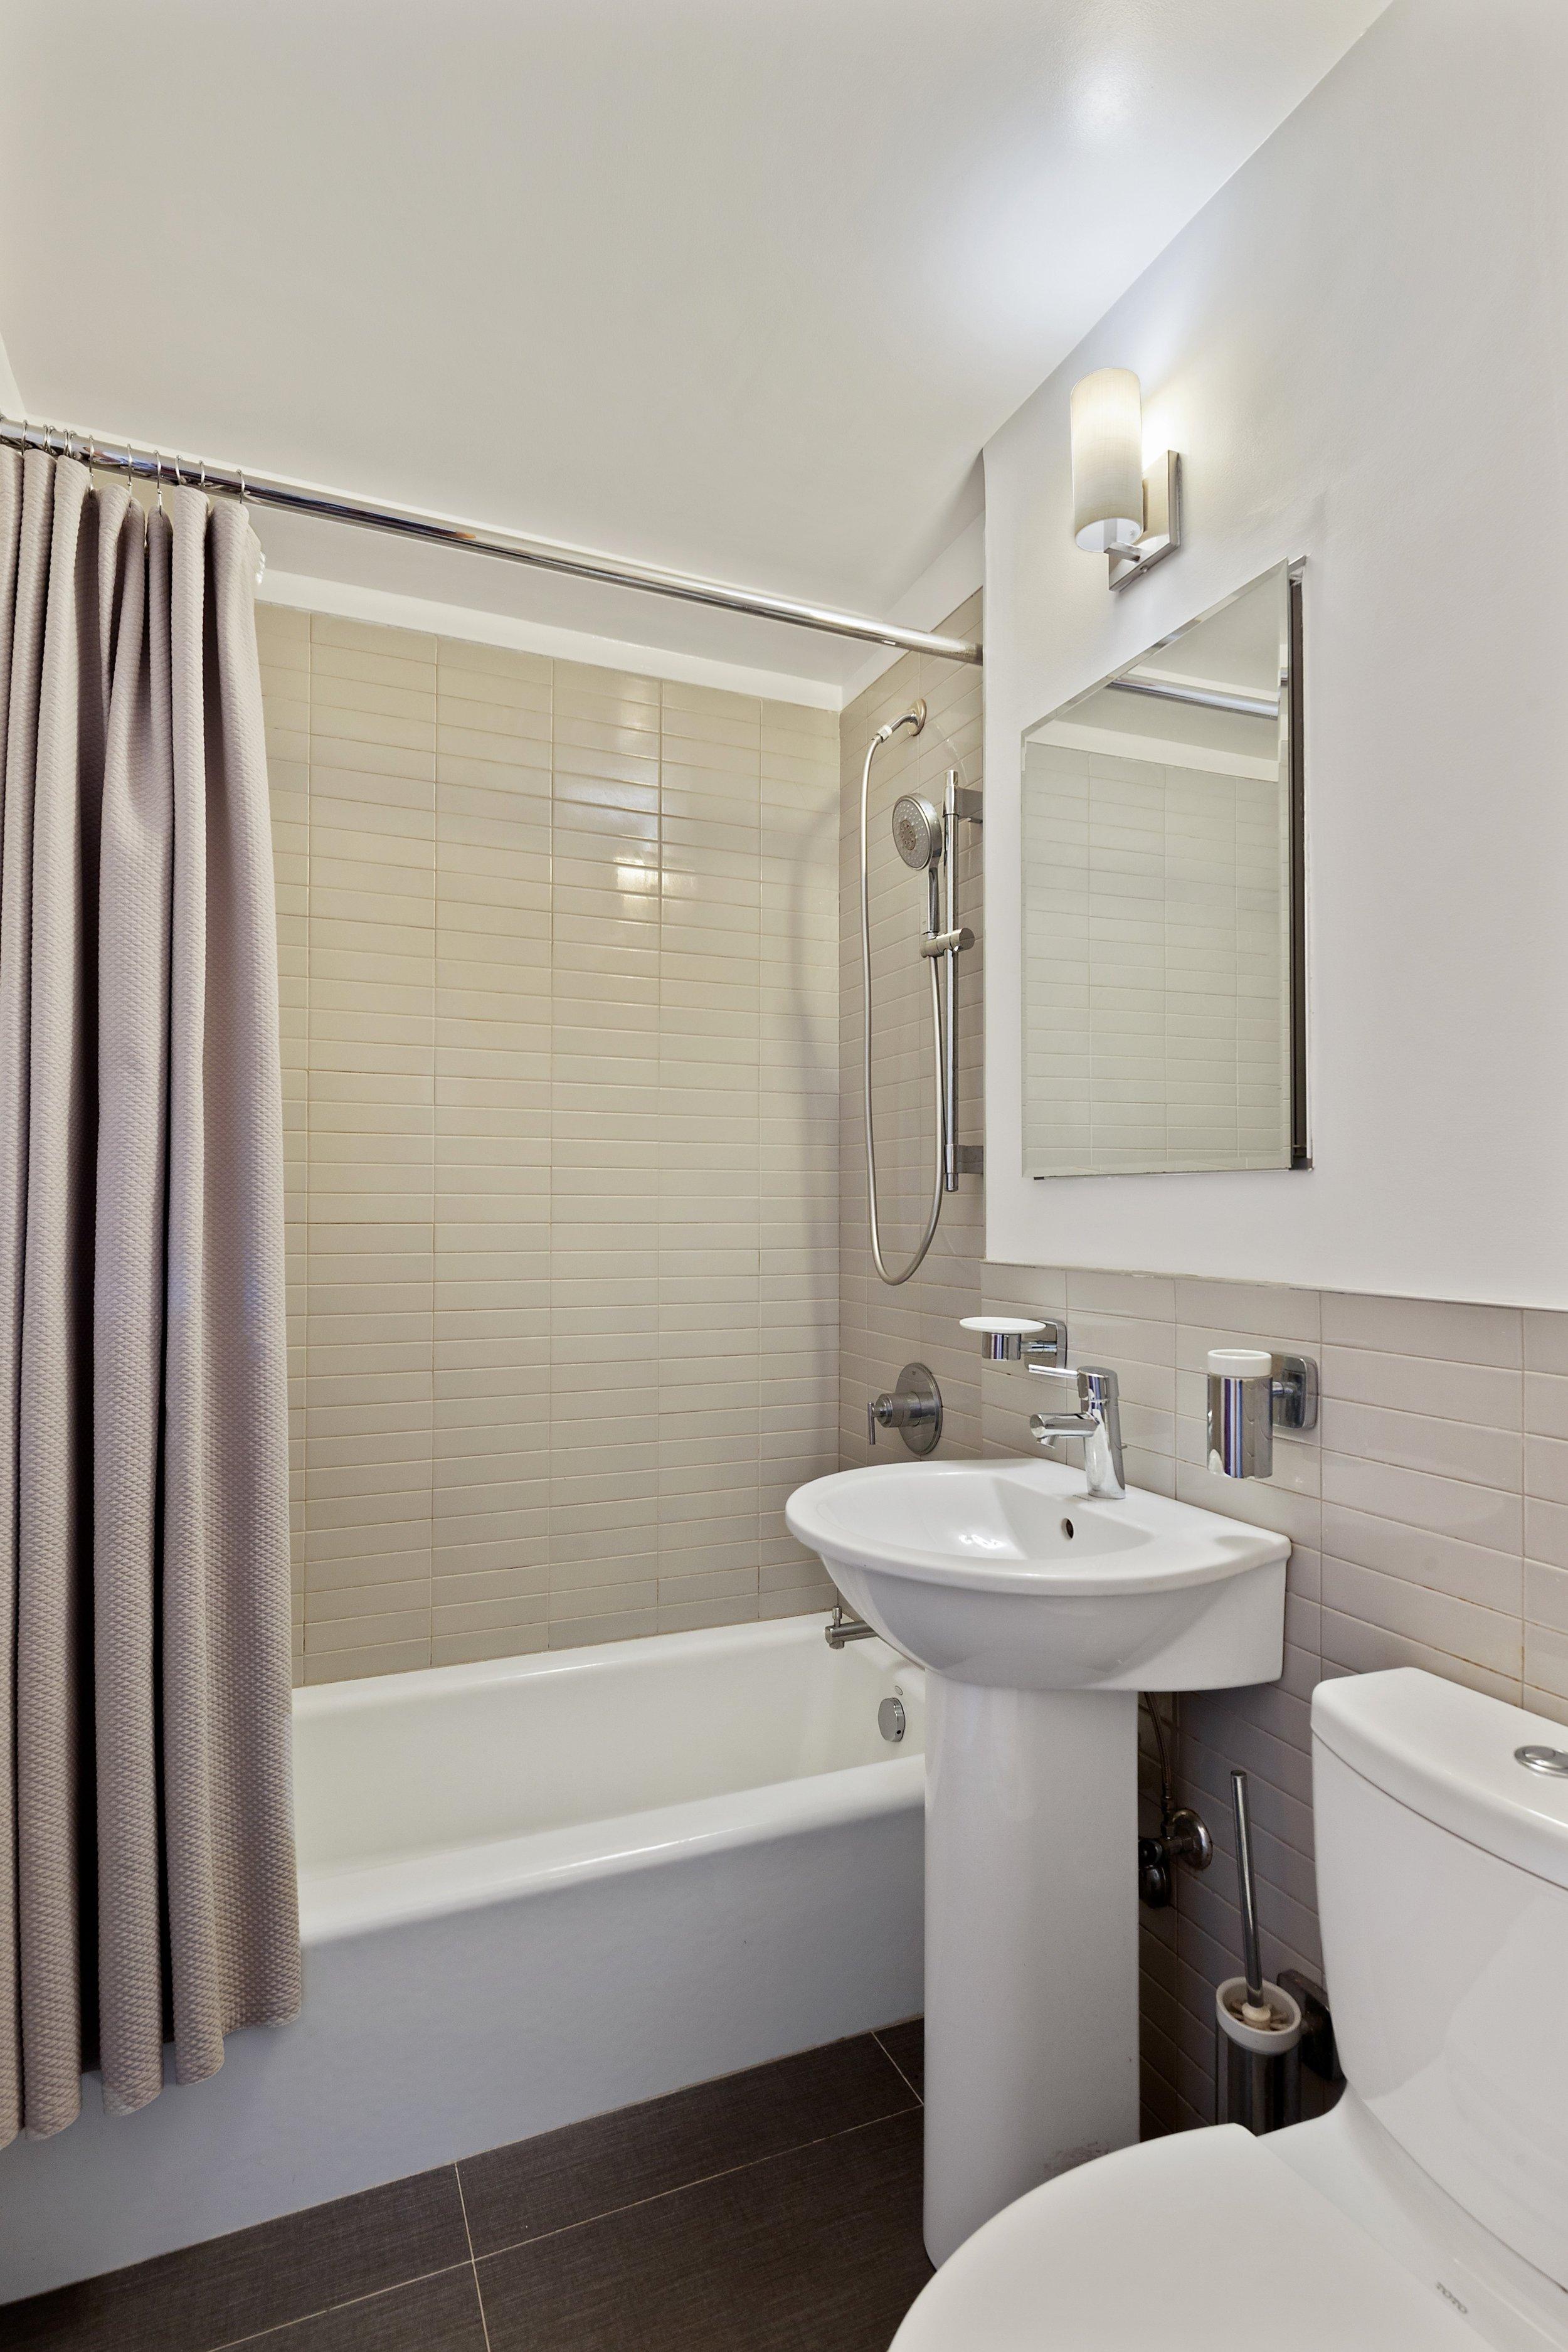 7_45GraceCourt_Apt5E_8_Bathroom_HiRes.jpg